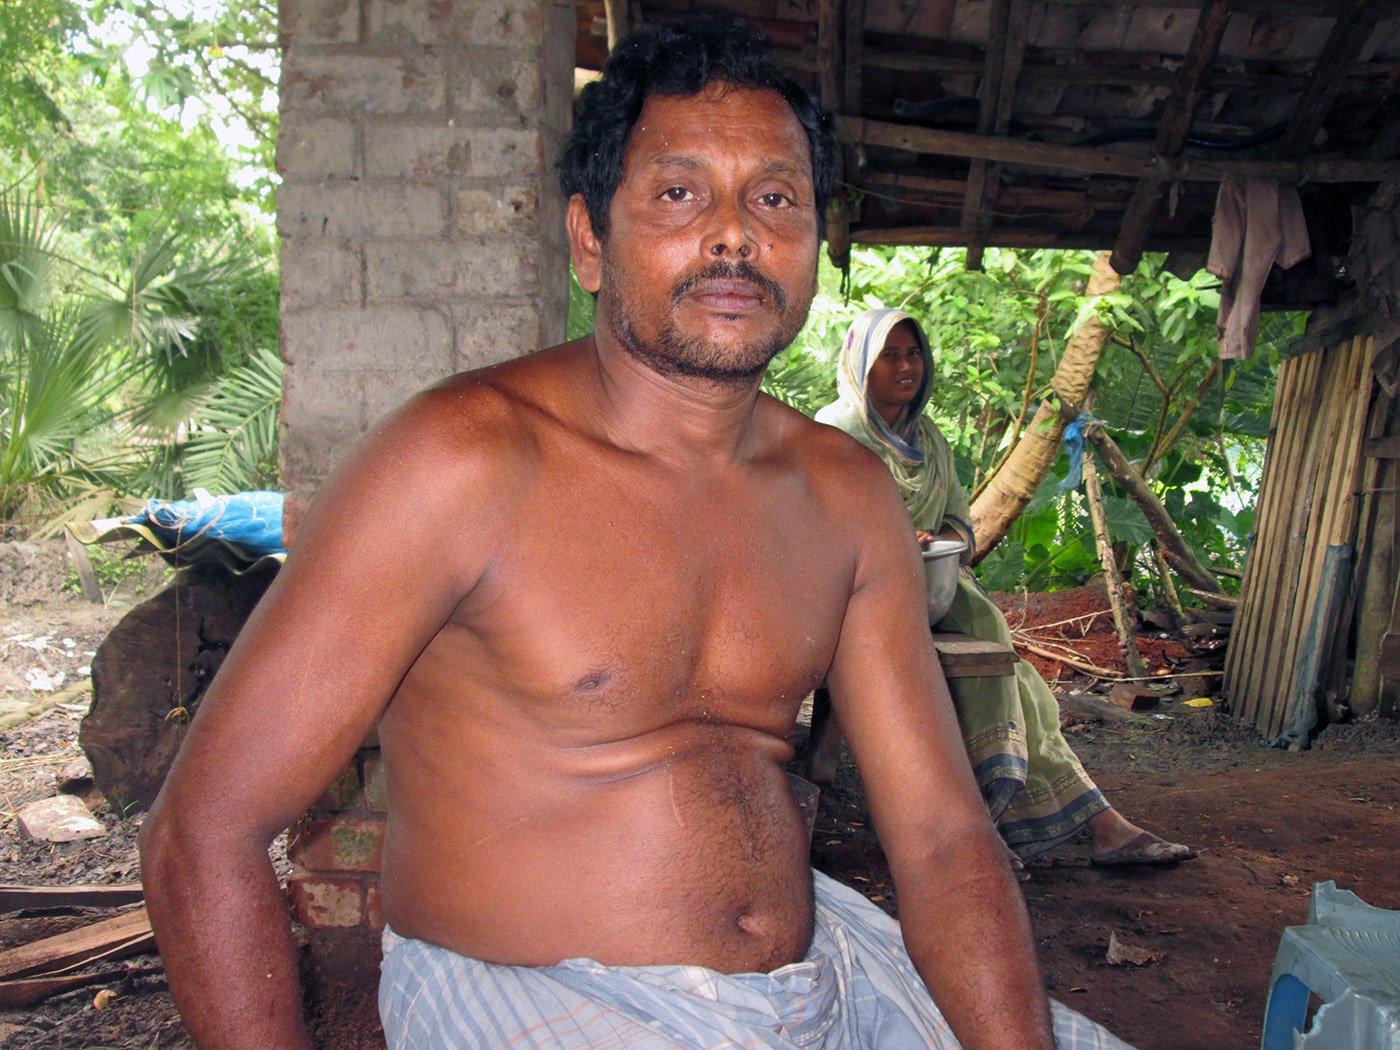 a man whose ancestors migrated